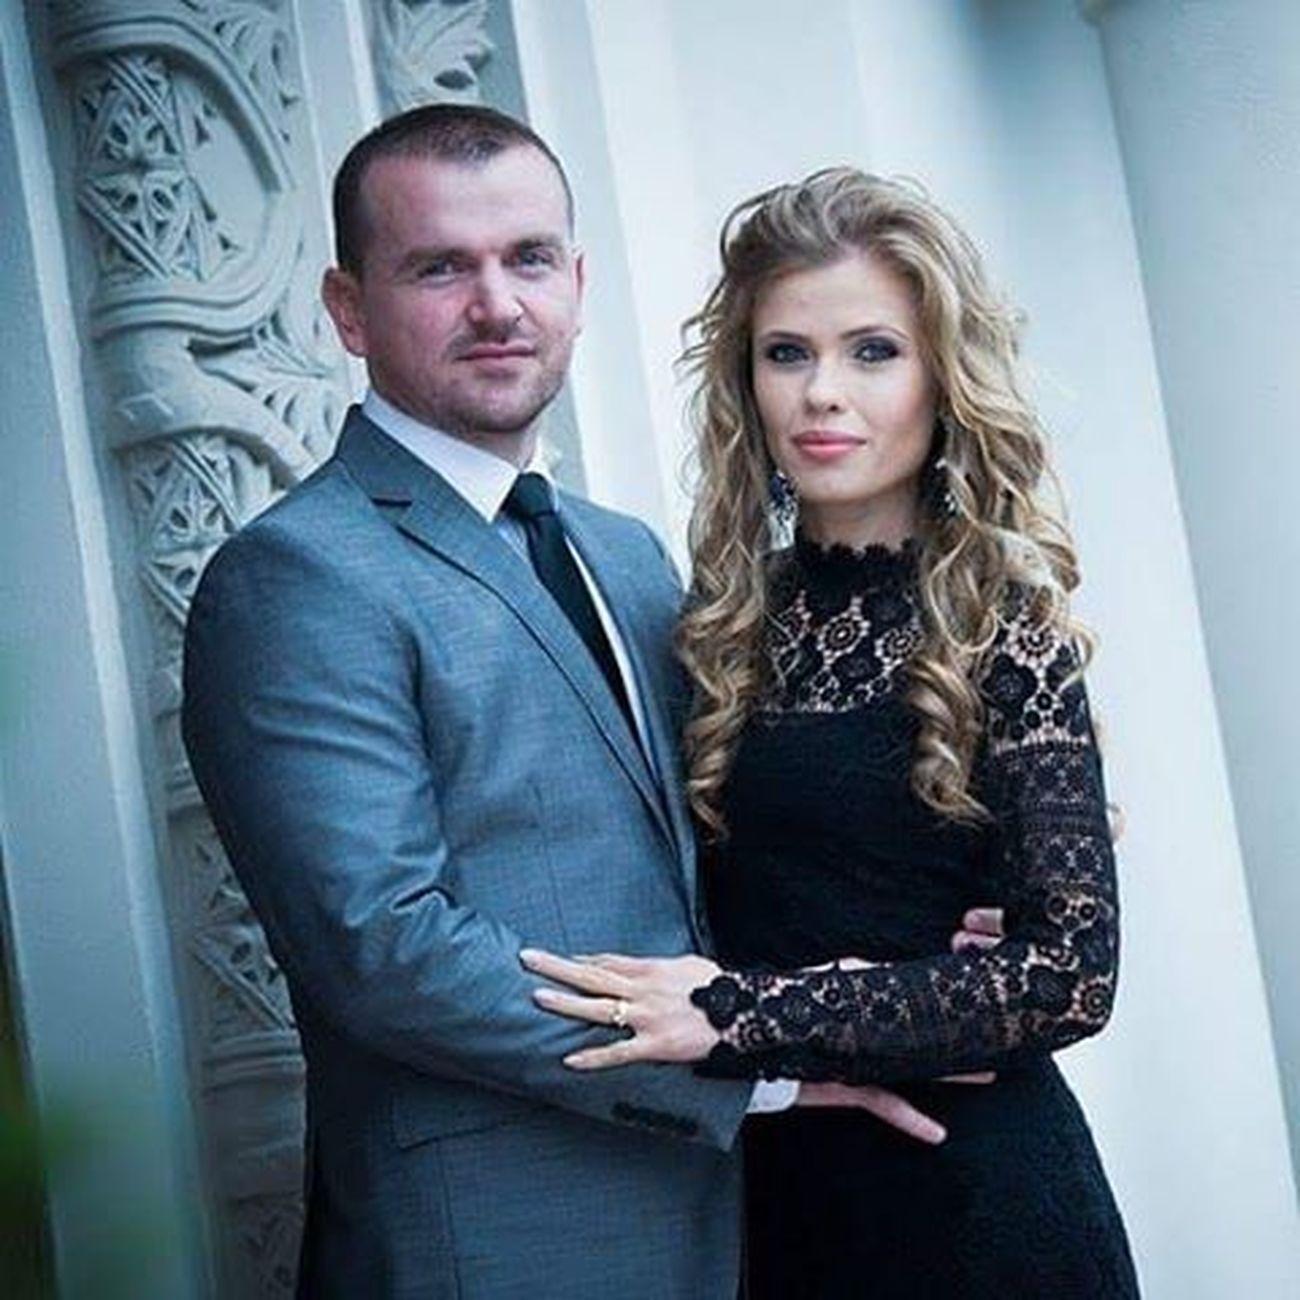 Us Husband Wife Family Wedding Ceremony Godfather Love Friends Instamood Fashion Instacool Live Life Instafashion Sun Curly Hair Long Lips Lucury Lux